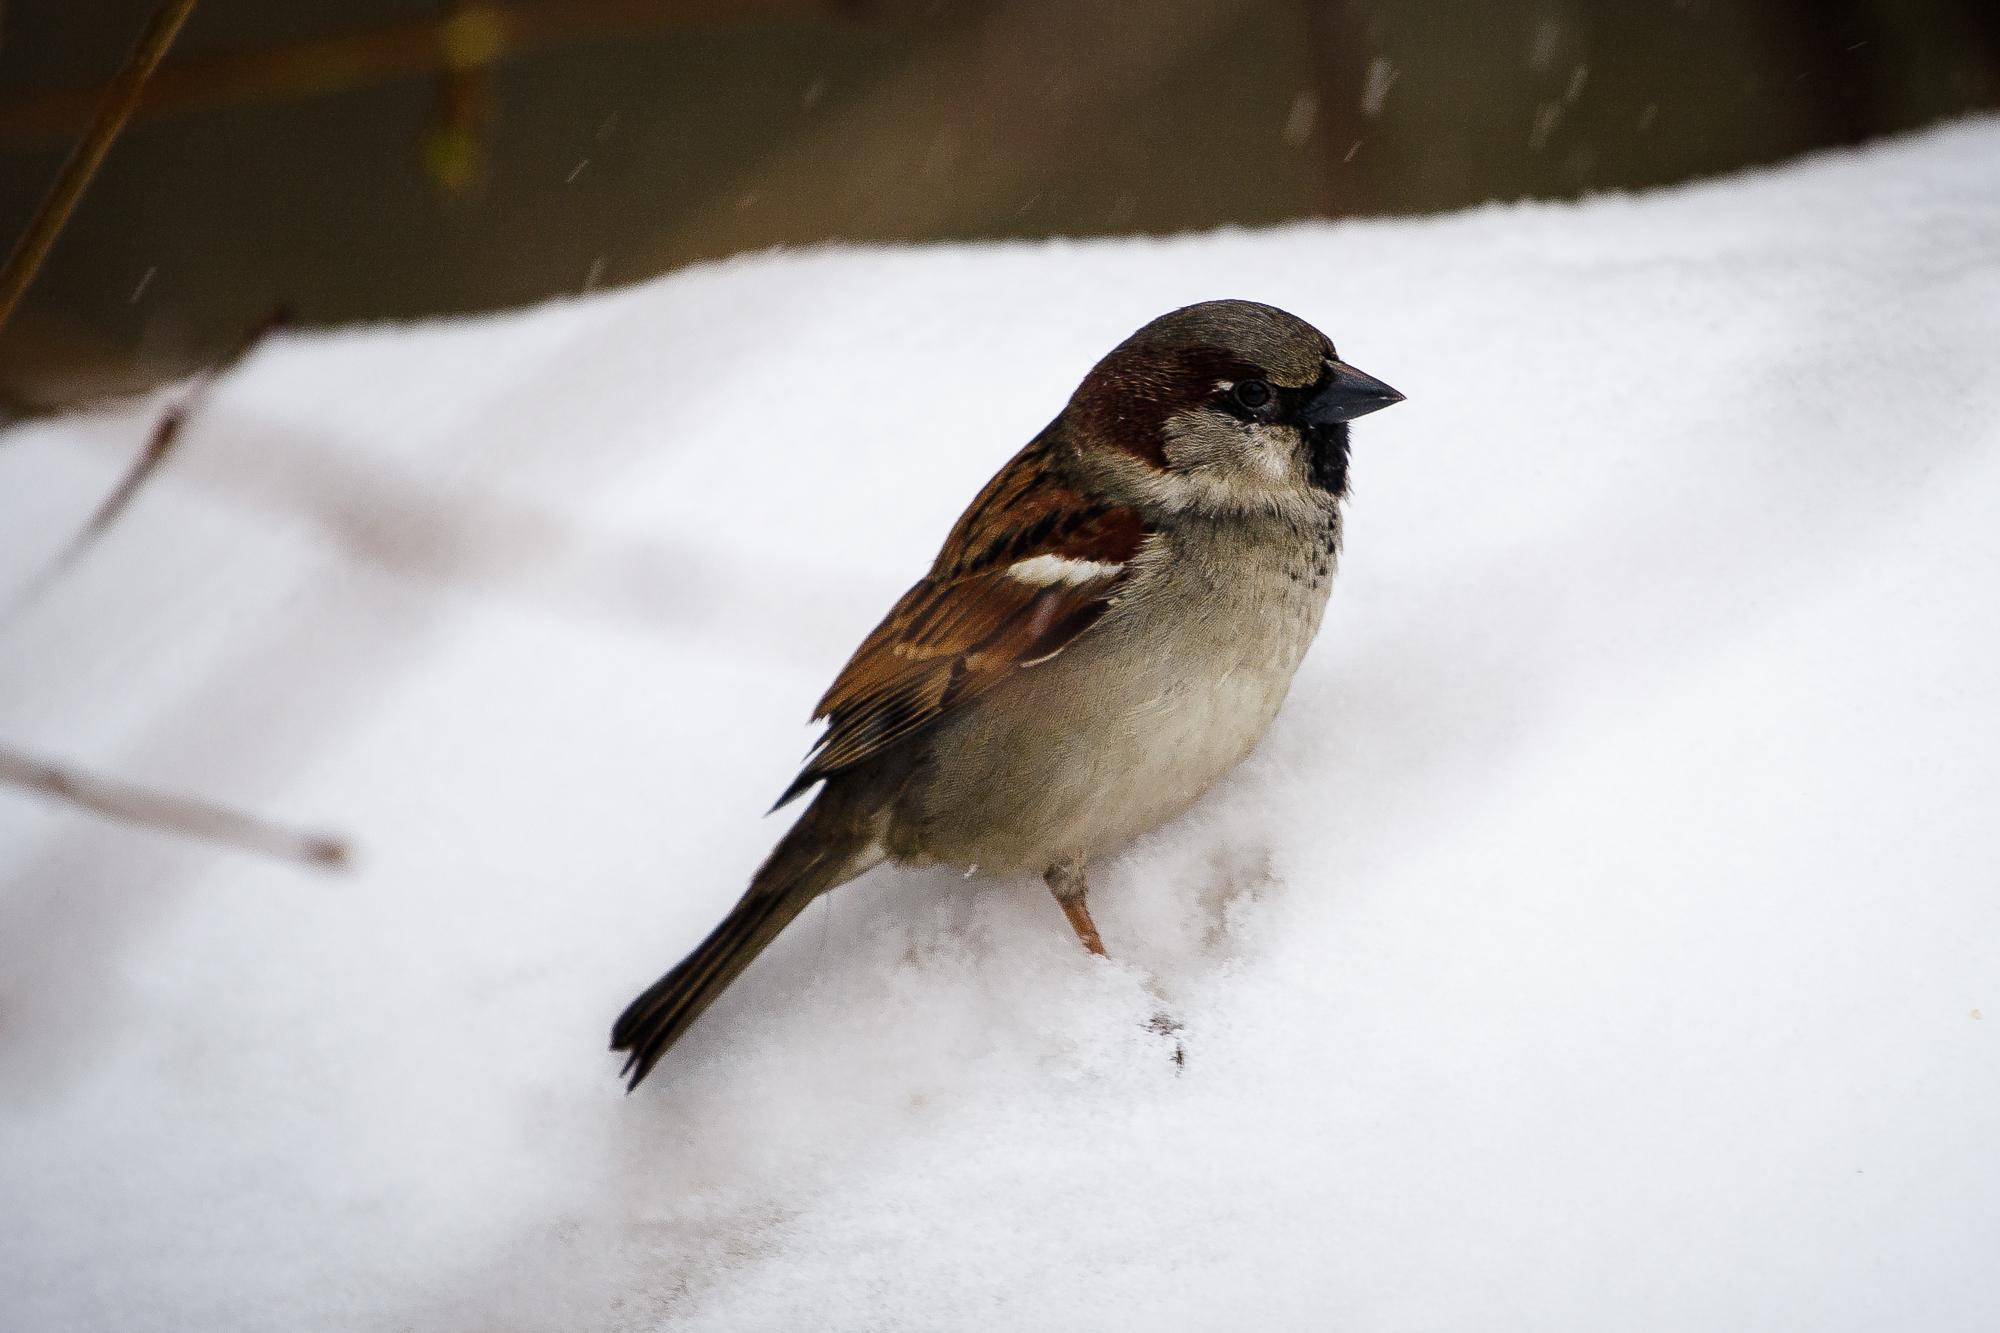 Sparrow In Snow Via @Atisgailis